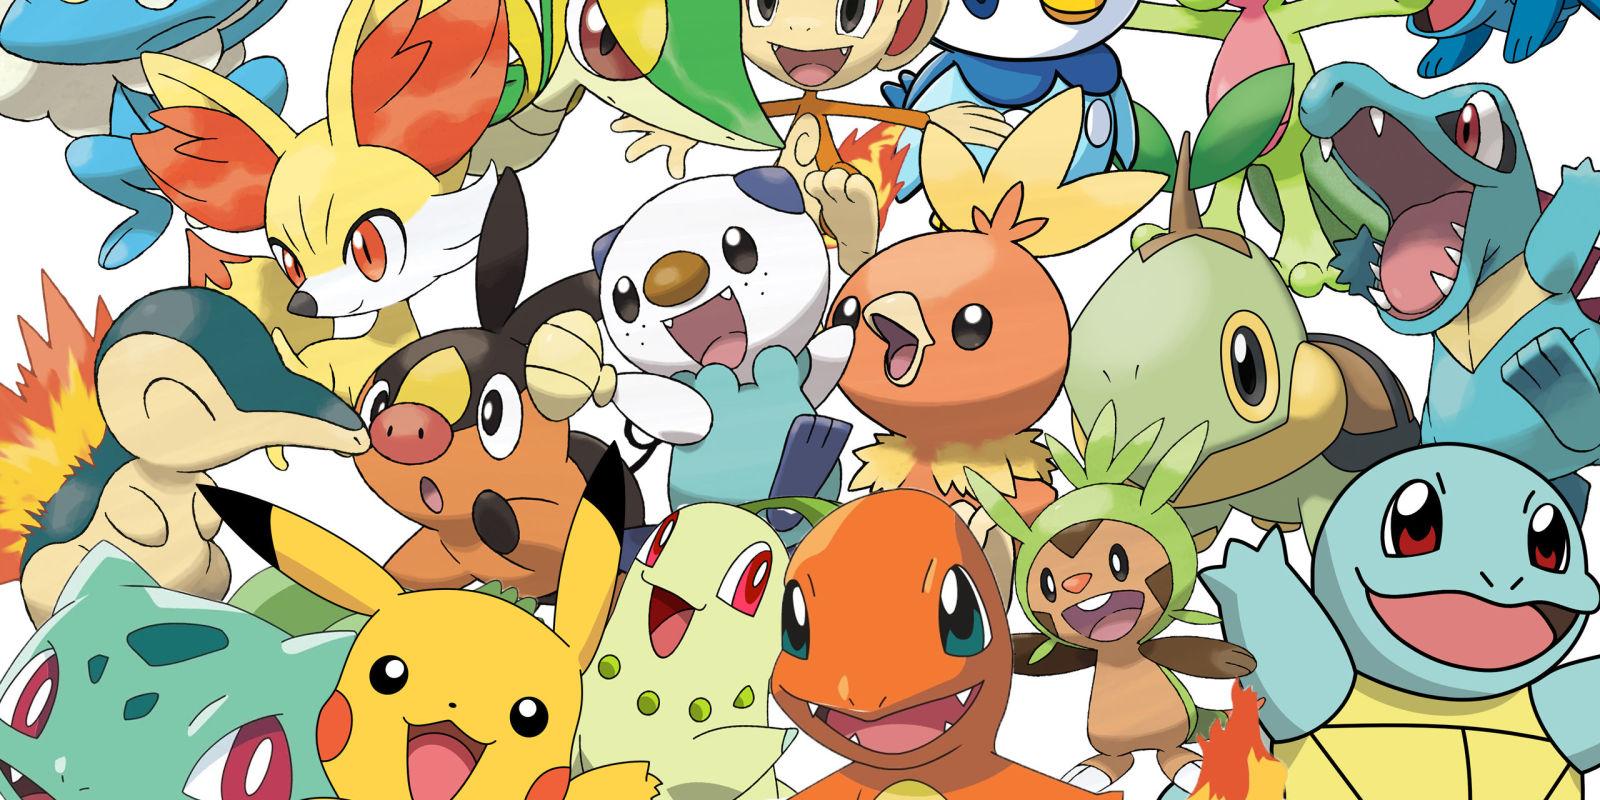 Pokemon Backgrounds, Compatible - PC, Mobile, Gadgets  1600x800 px